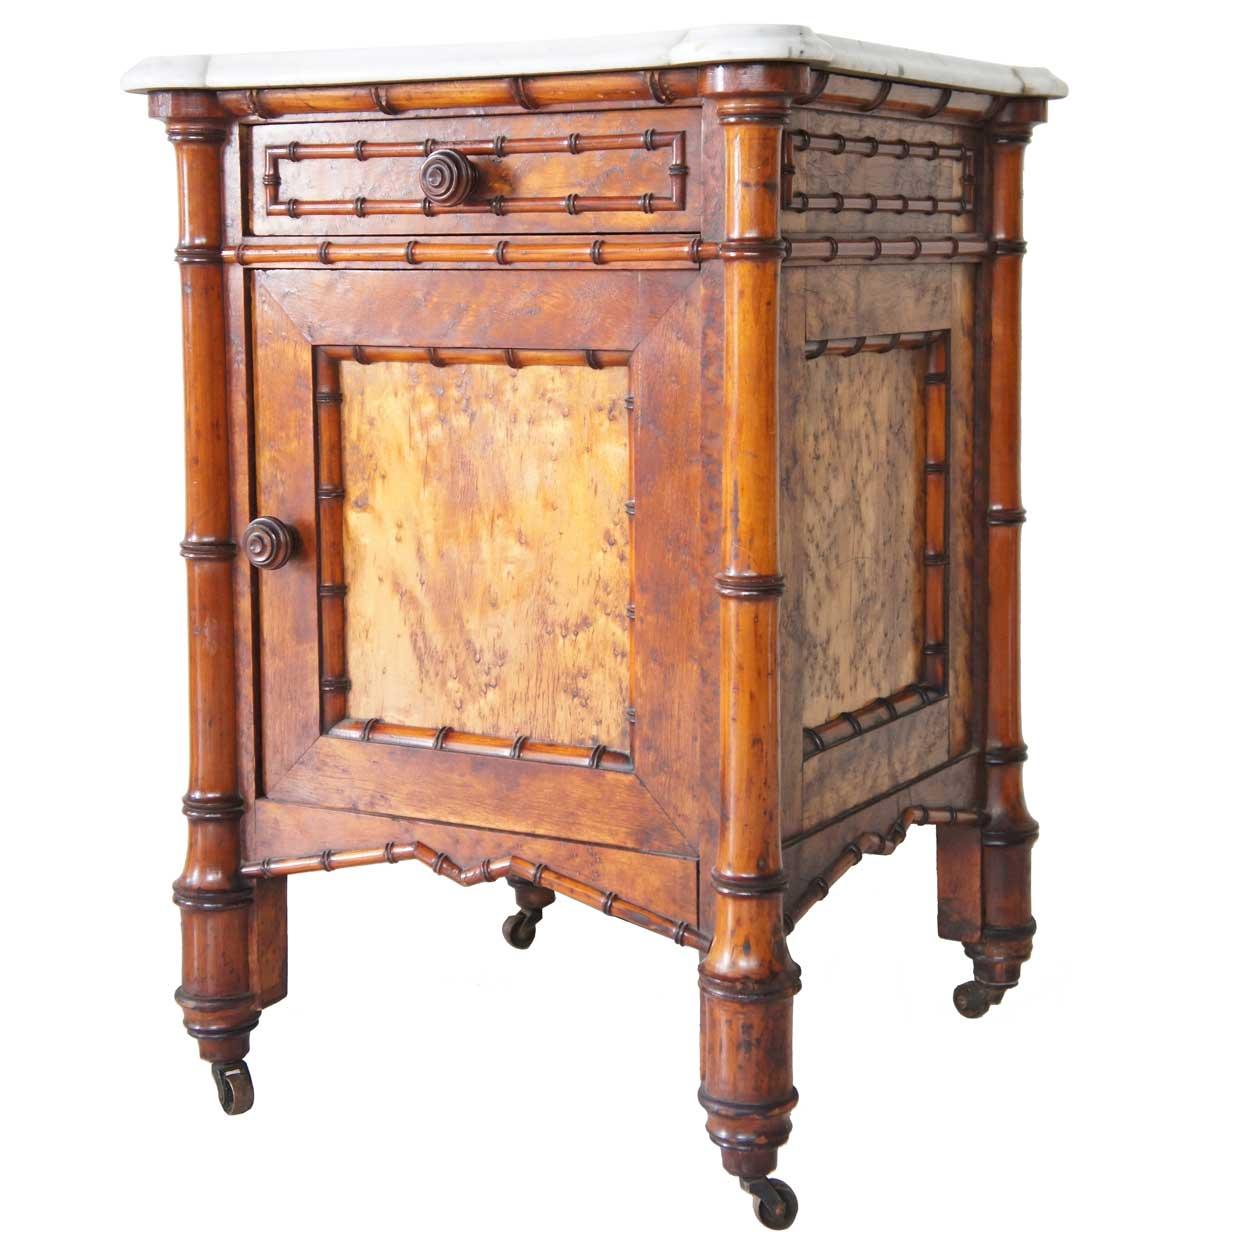 Ref B 84 0001 6 Seven Piece American R J Horner Birdseye Maple Faux Bamboo Bedroom Suite For